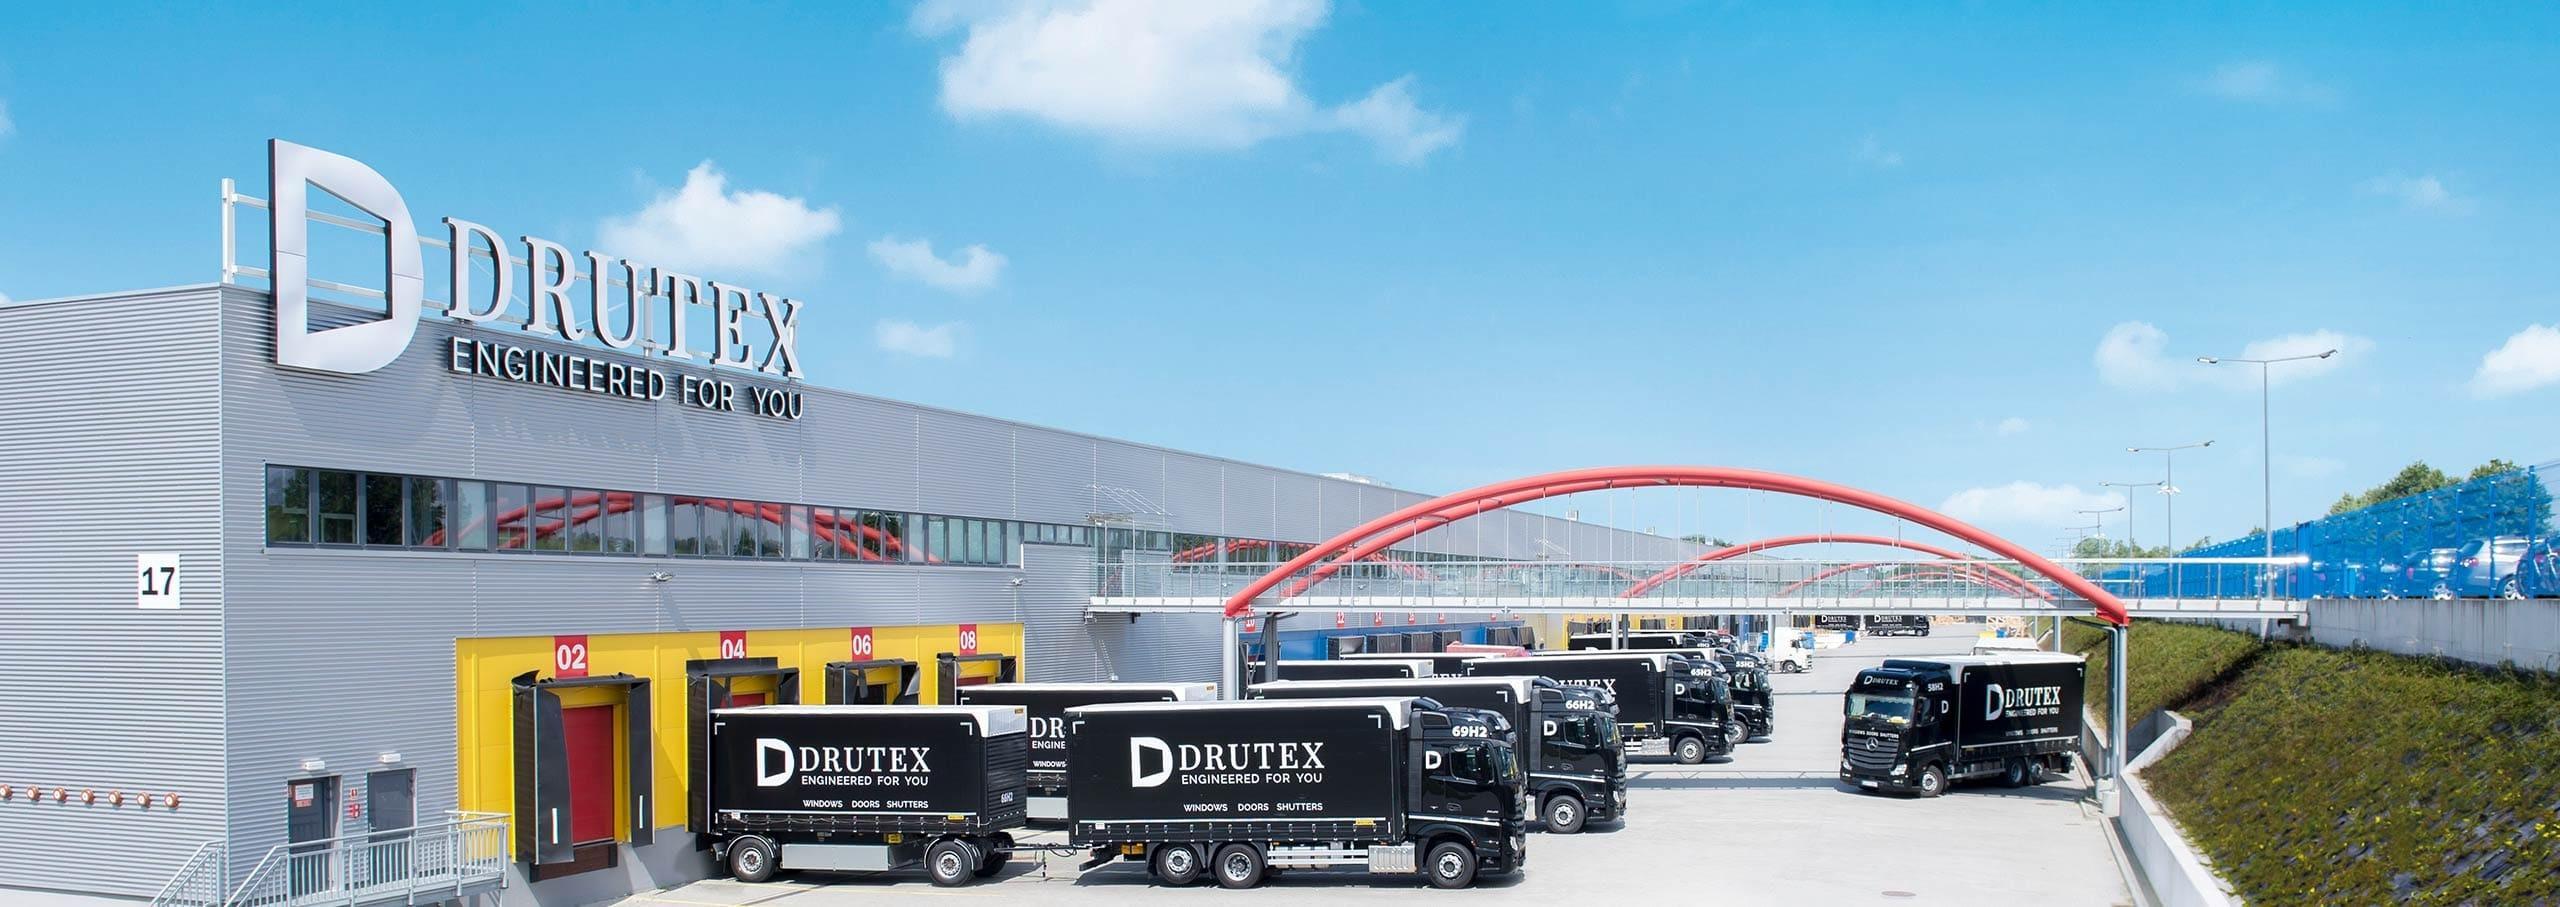 Historia firmy Drutex | Agart.net.pl